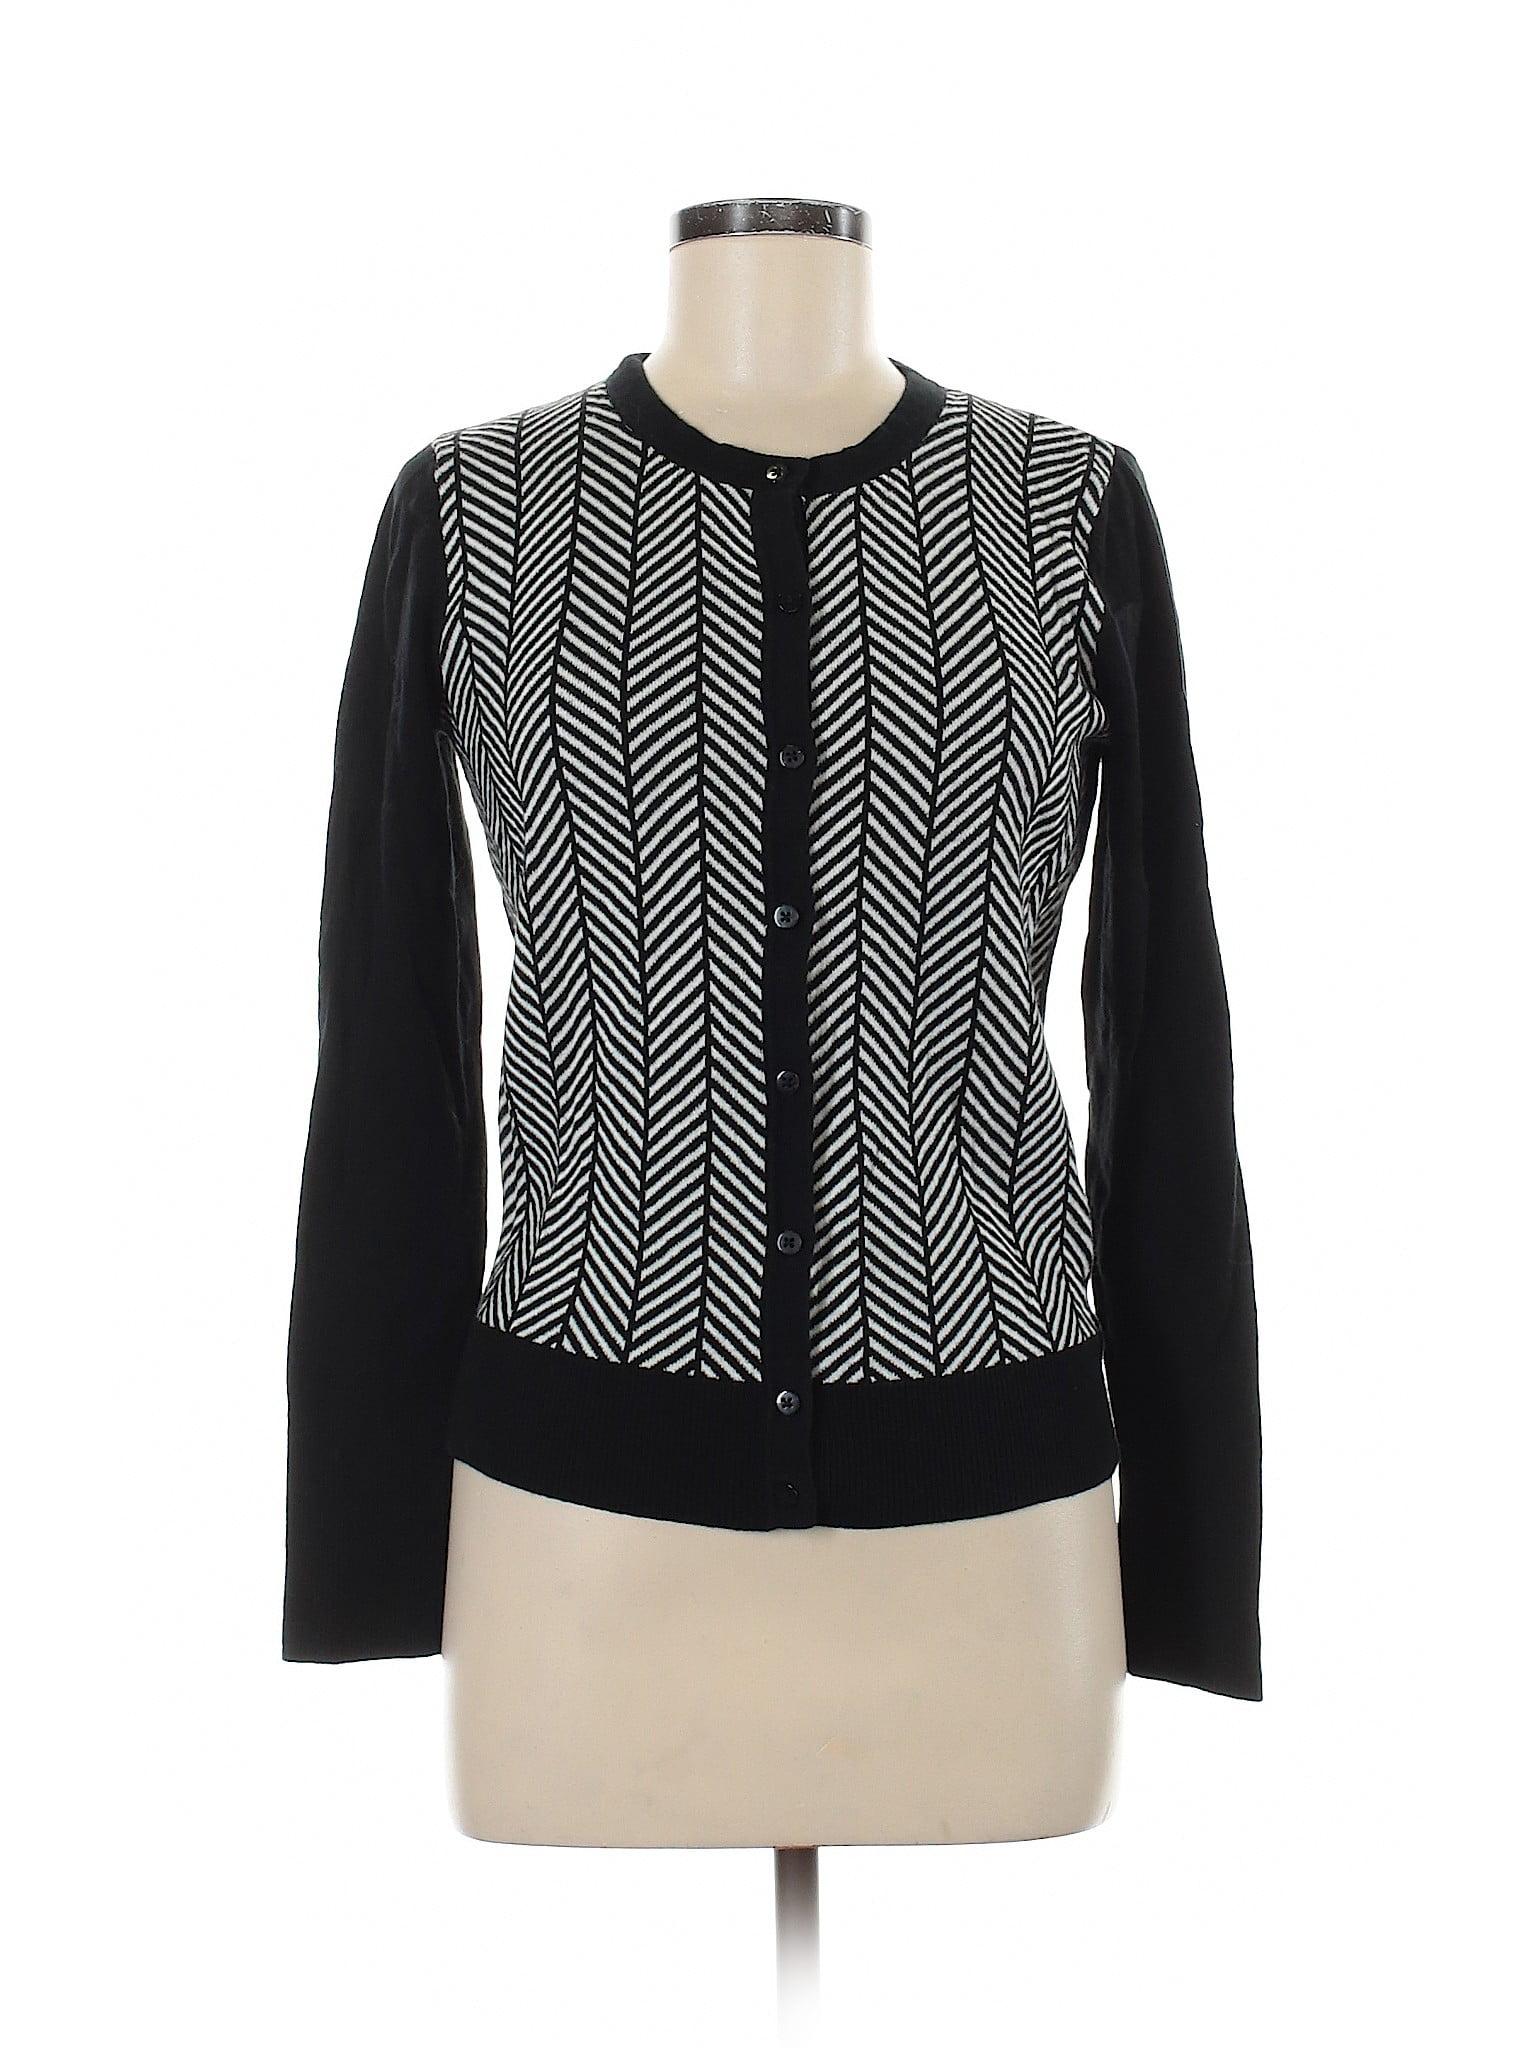 NEW MERONA Men/'s Green /& Black Checkered Plaid Sweater Size M